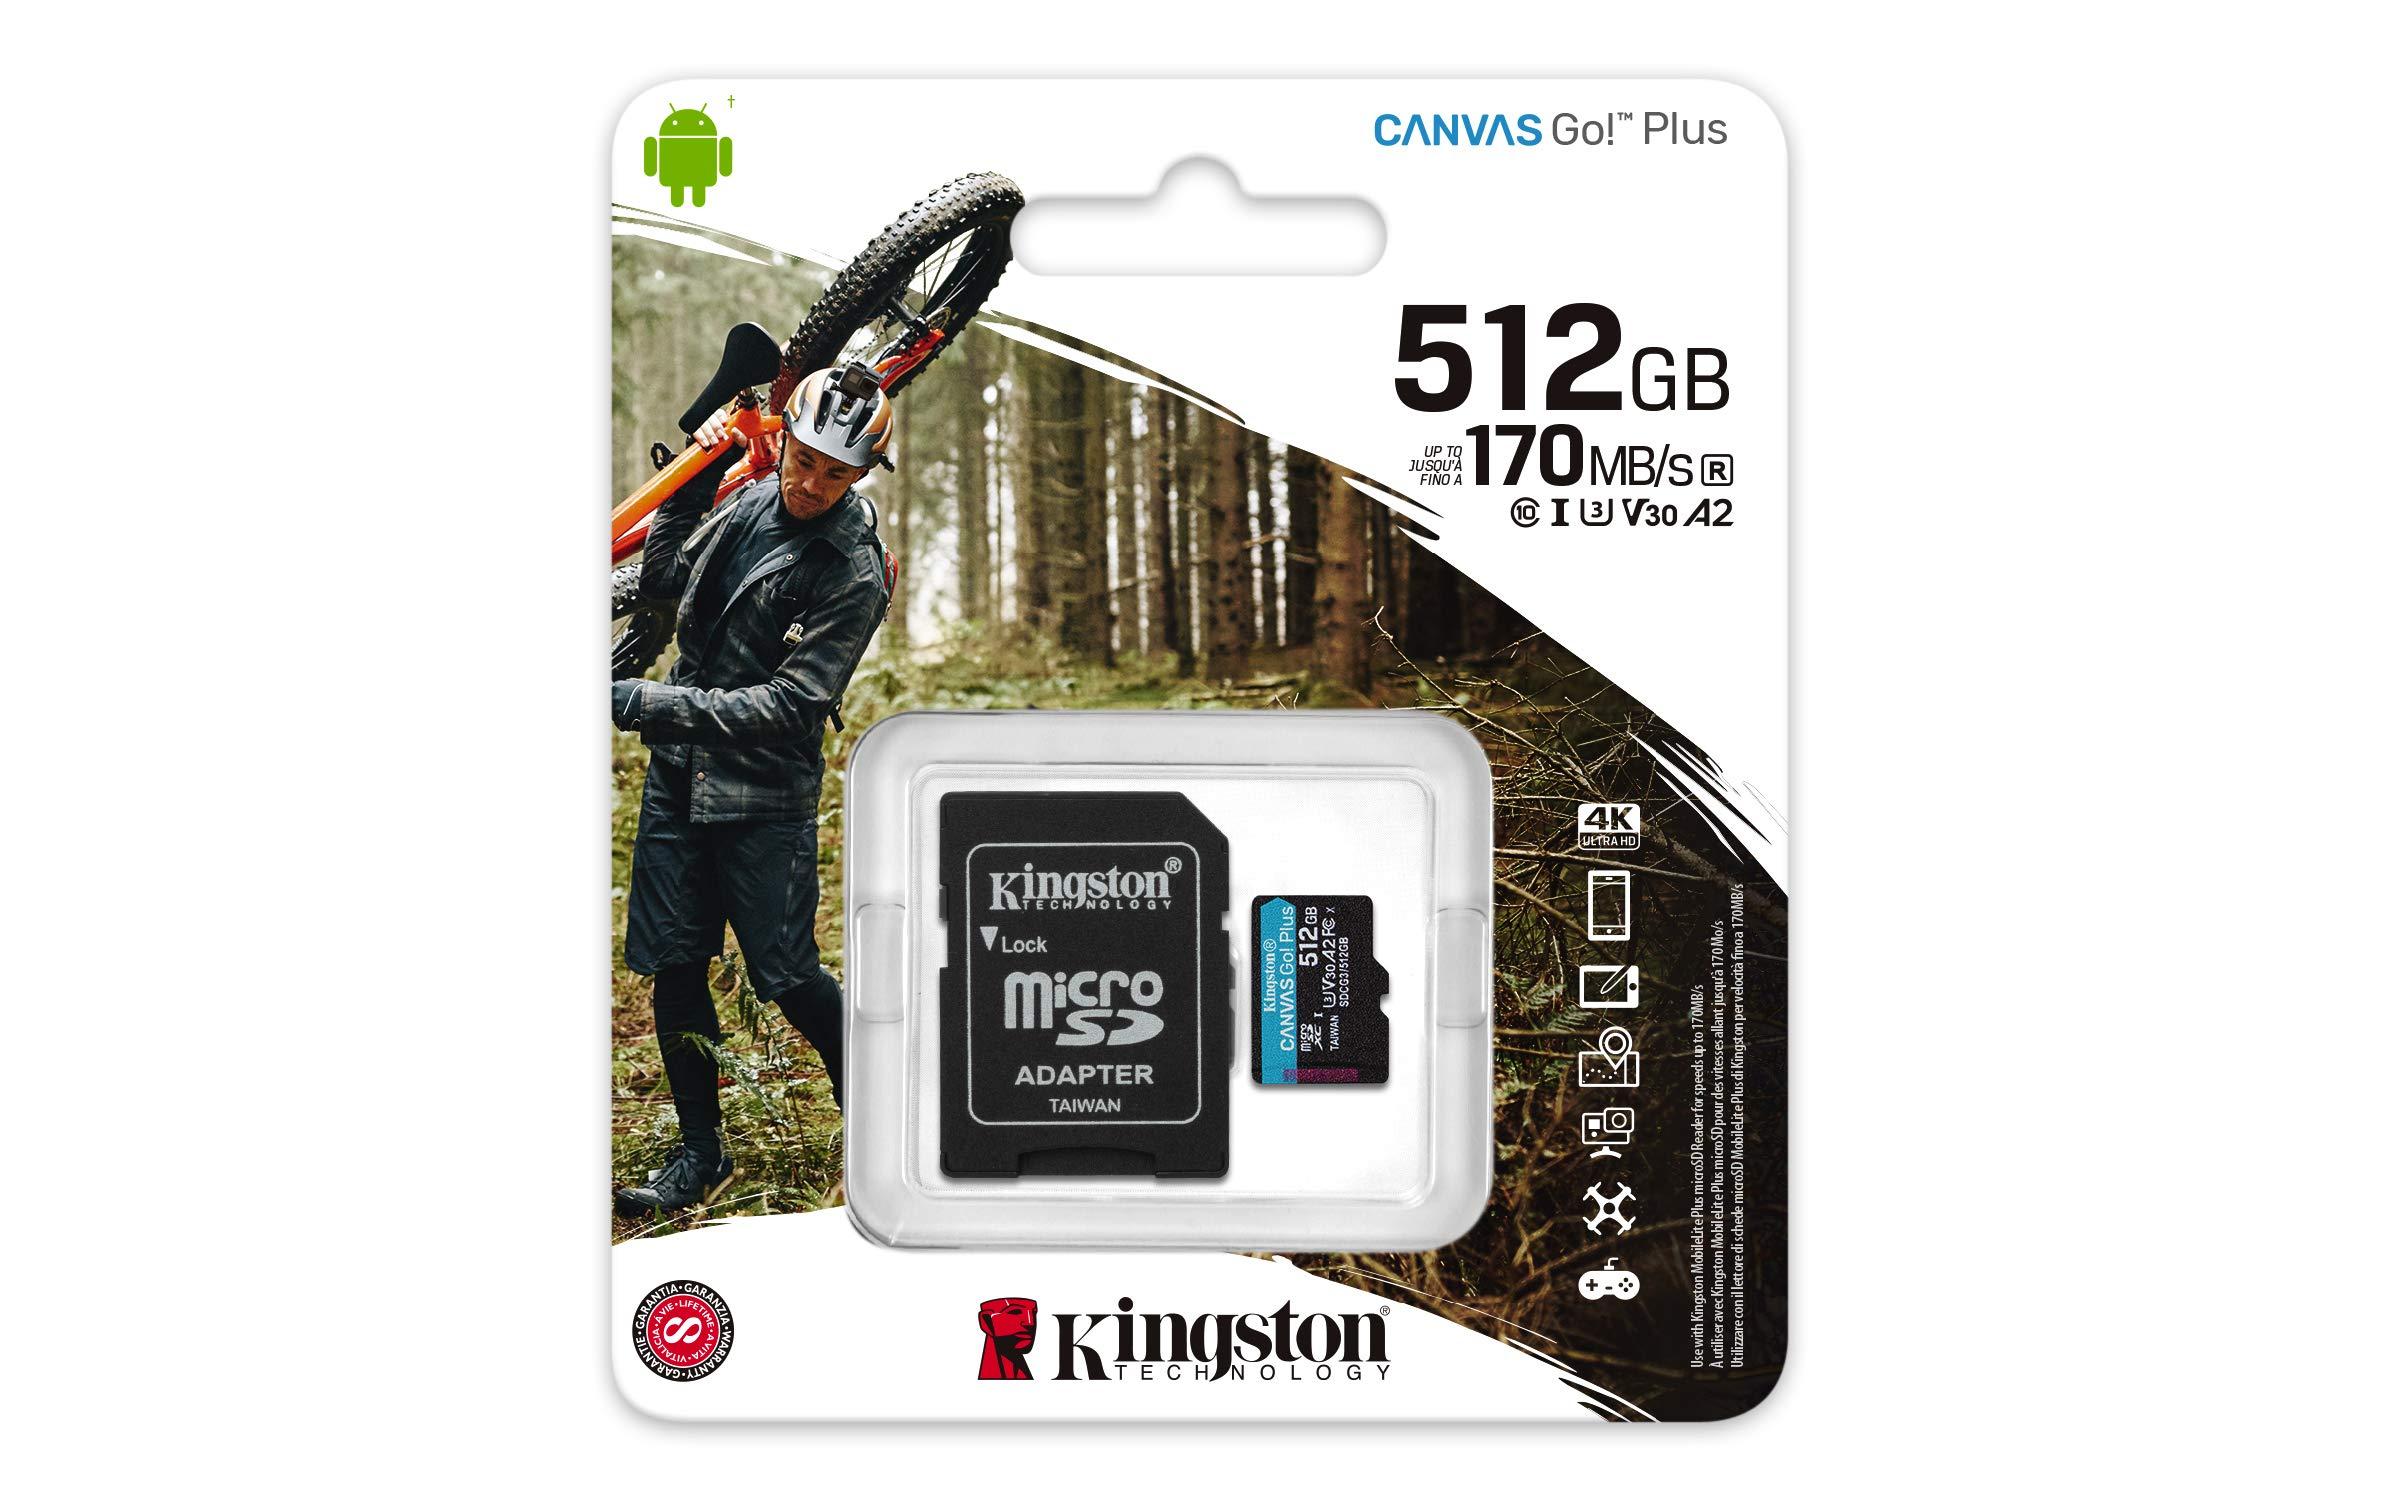 100MBs Works with Kingston Kingston 512GB ZTE Telstra Tough Max MicroSDXC Canvas Select Plus Card Verified by SanFlash.